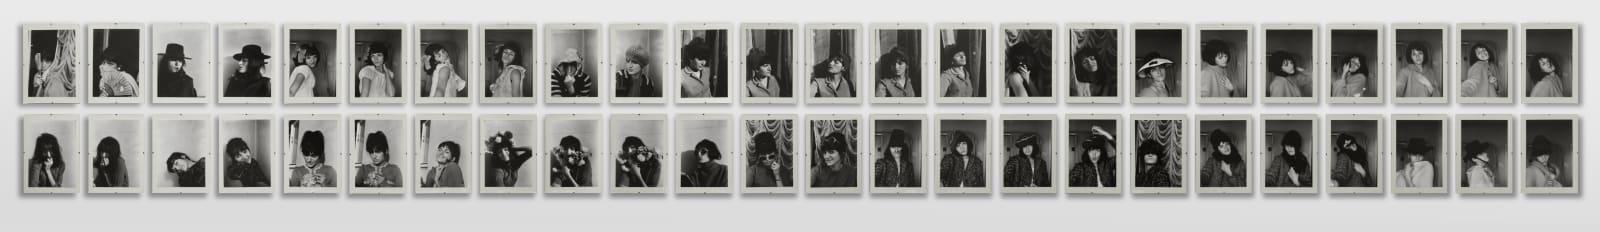 Renate BERTLMANN Verwandlungen (Transformations), 1969/2013 53 black and white photographs 25 x 17 cm (each)